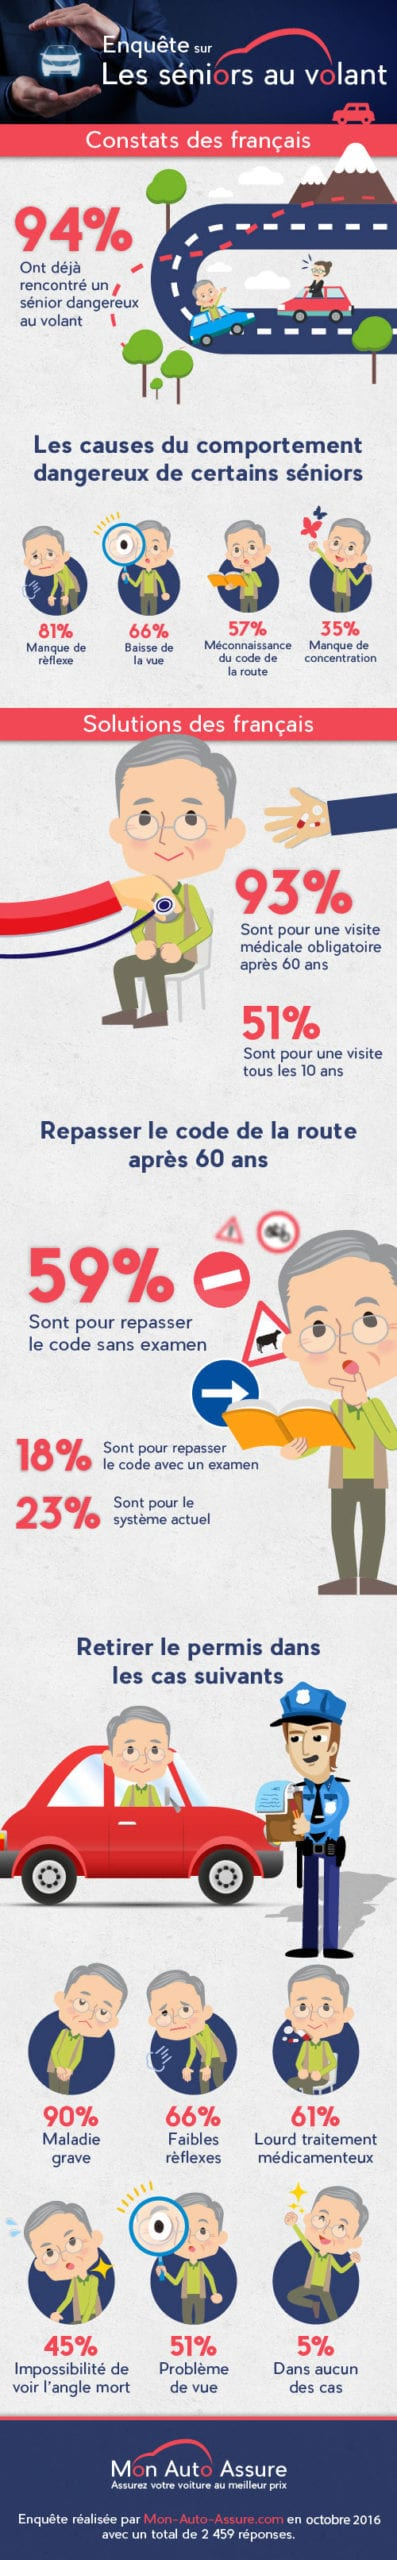 infographie-seniors-au-volant